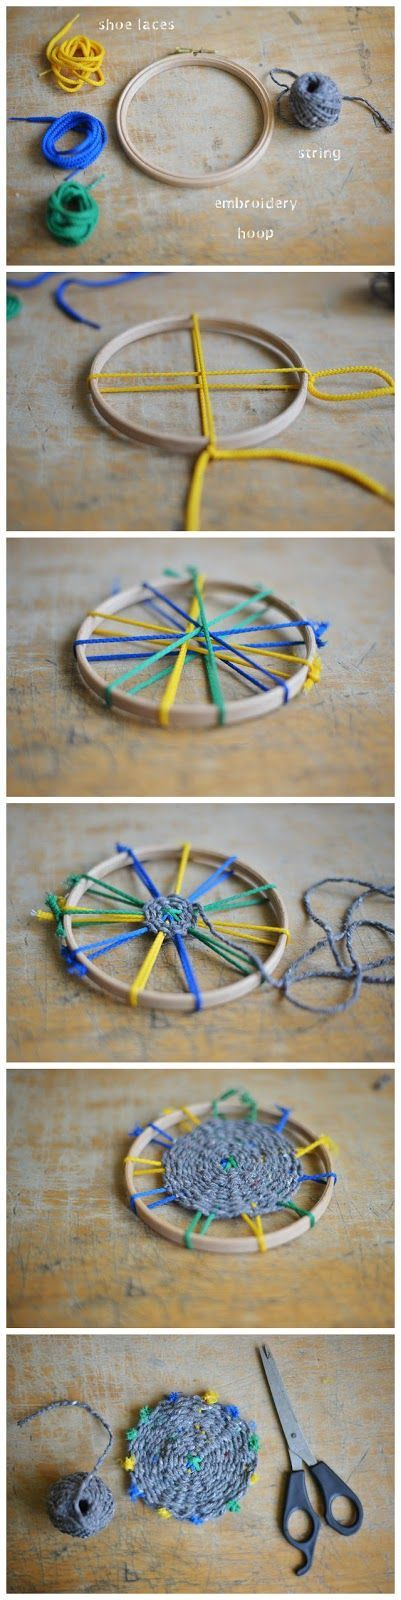 Diy Woven Coasters - Inspiring picture on Joyzz.com